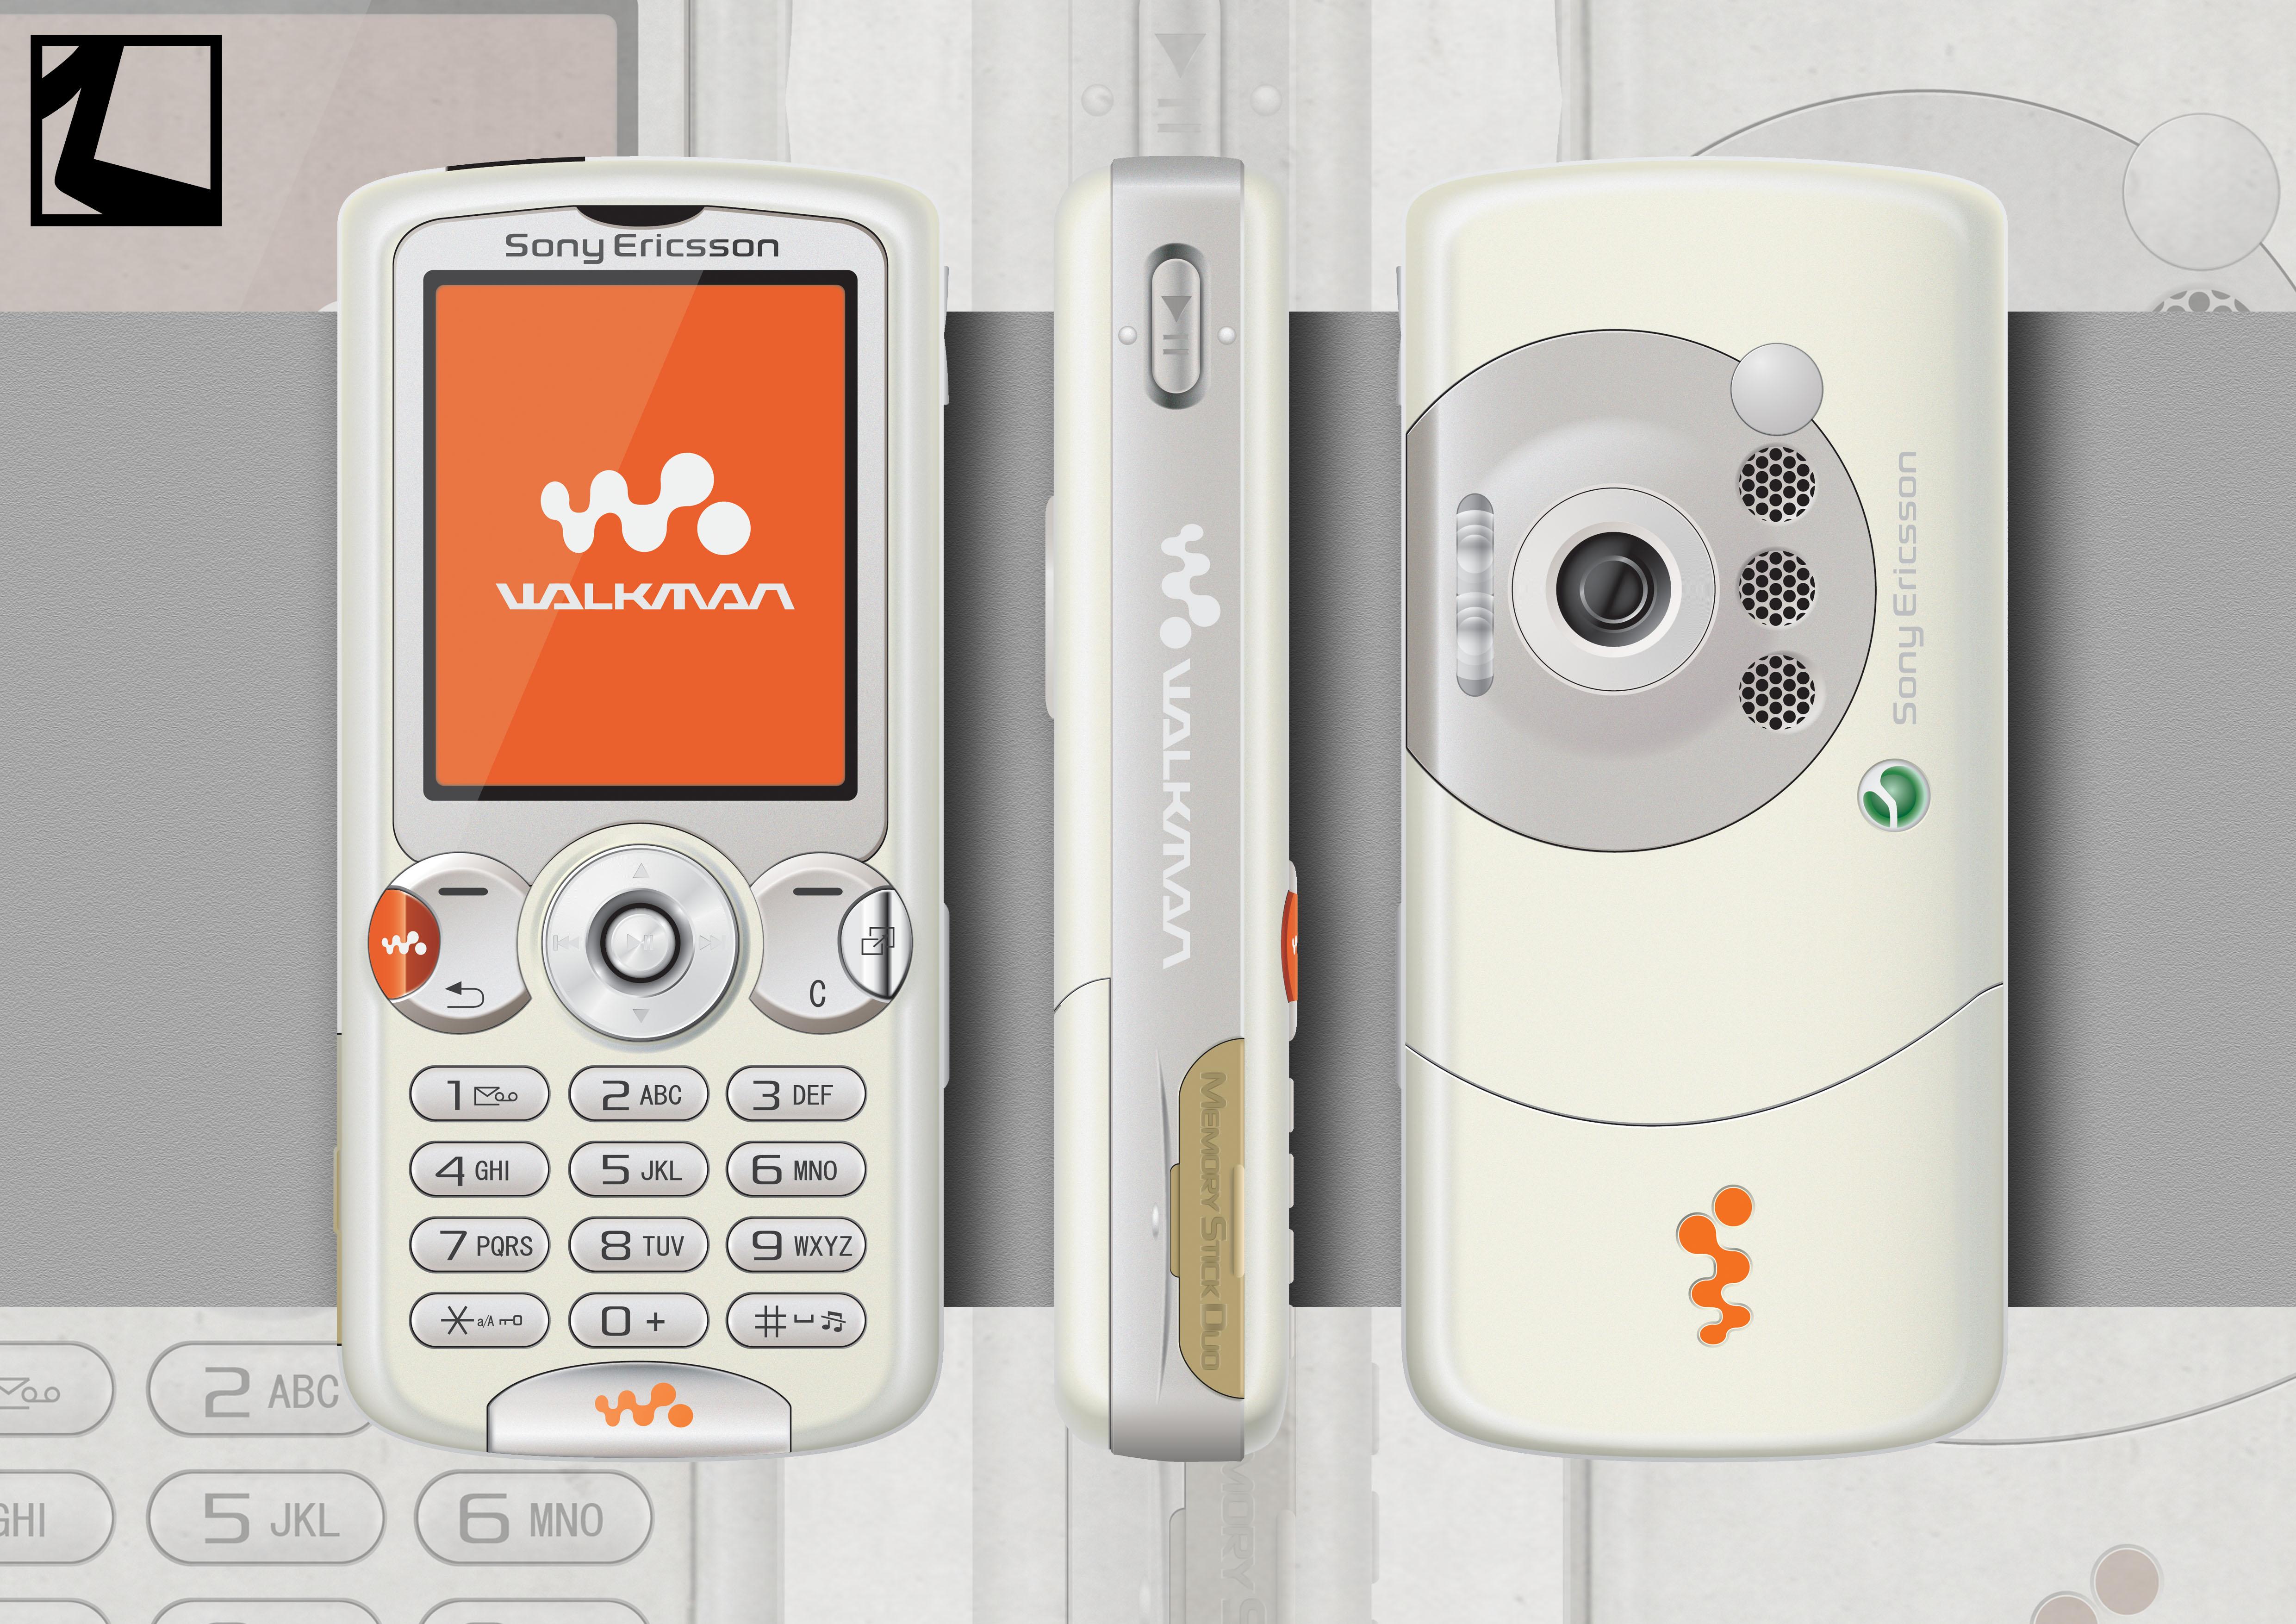 Включение телефона Инструкция по эксплуатации Sony Ericsson S500I DARK 77